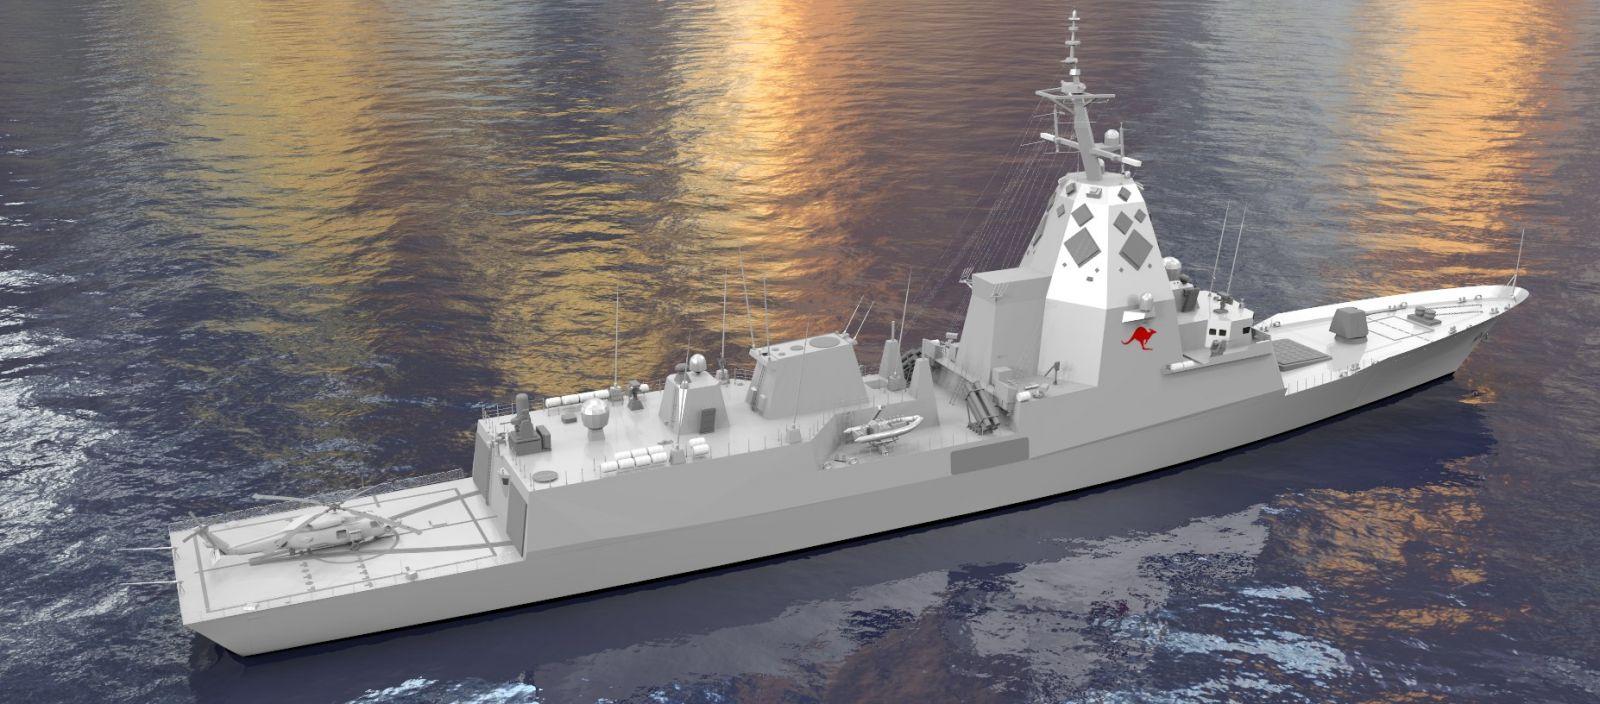 Trabajo boob de la Marina australiana